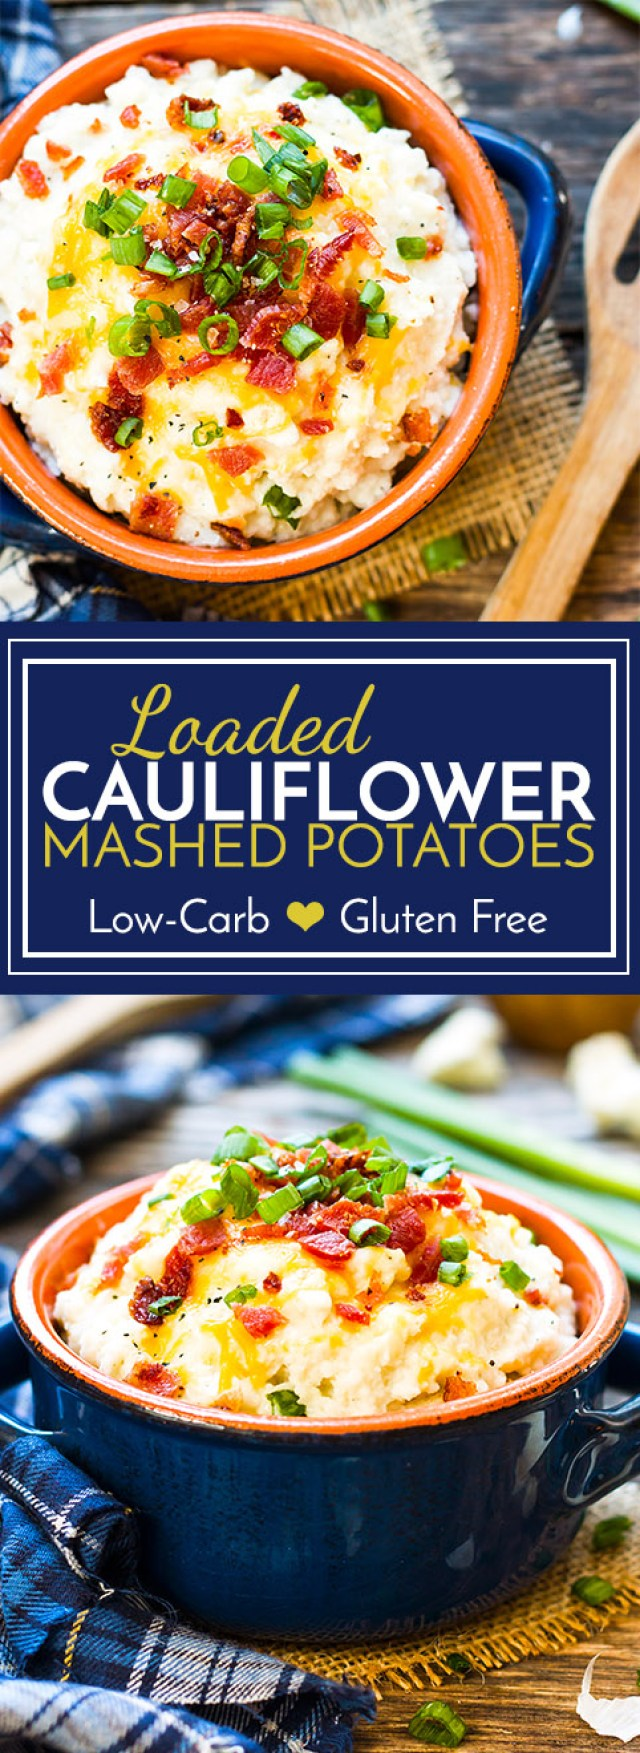 Loaded Cauliflower Mashed Potatoes